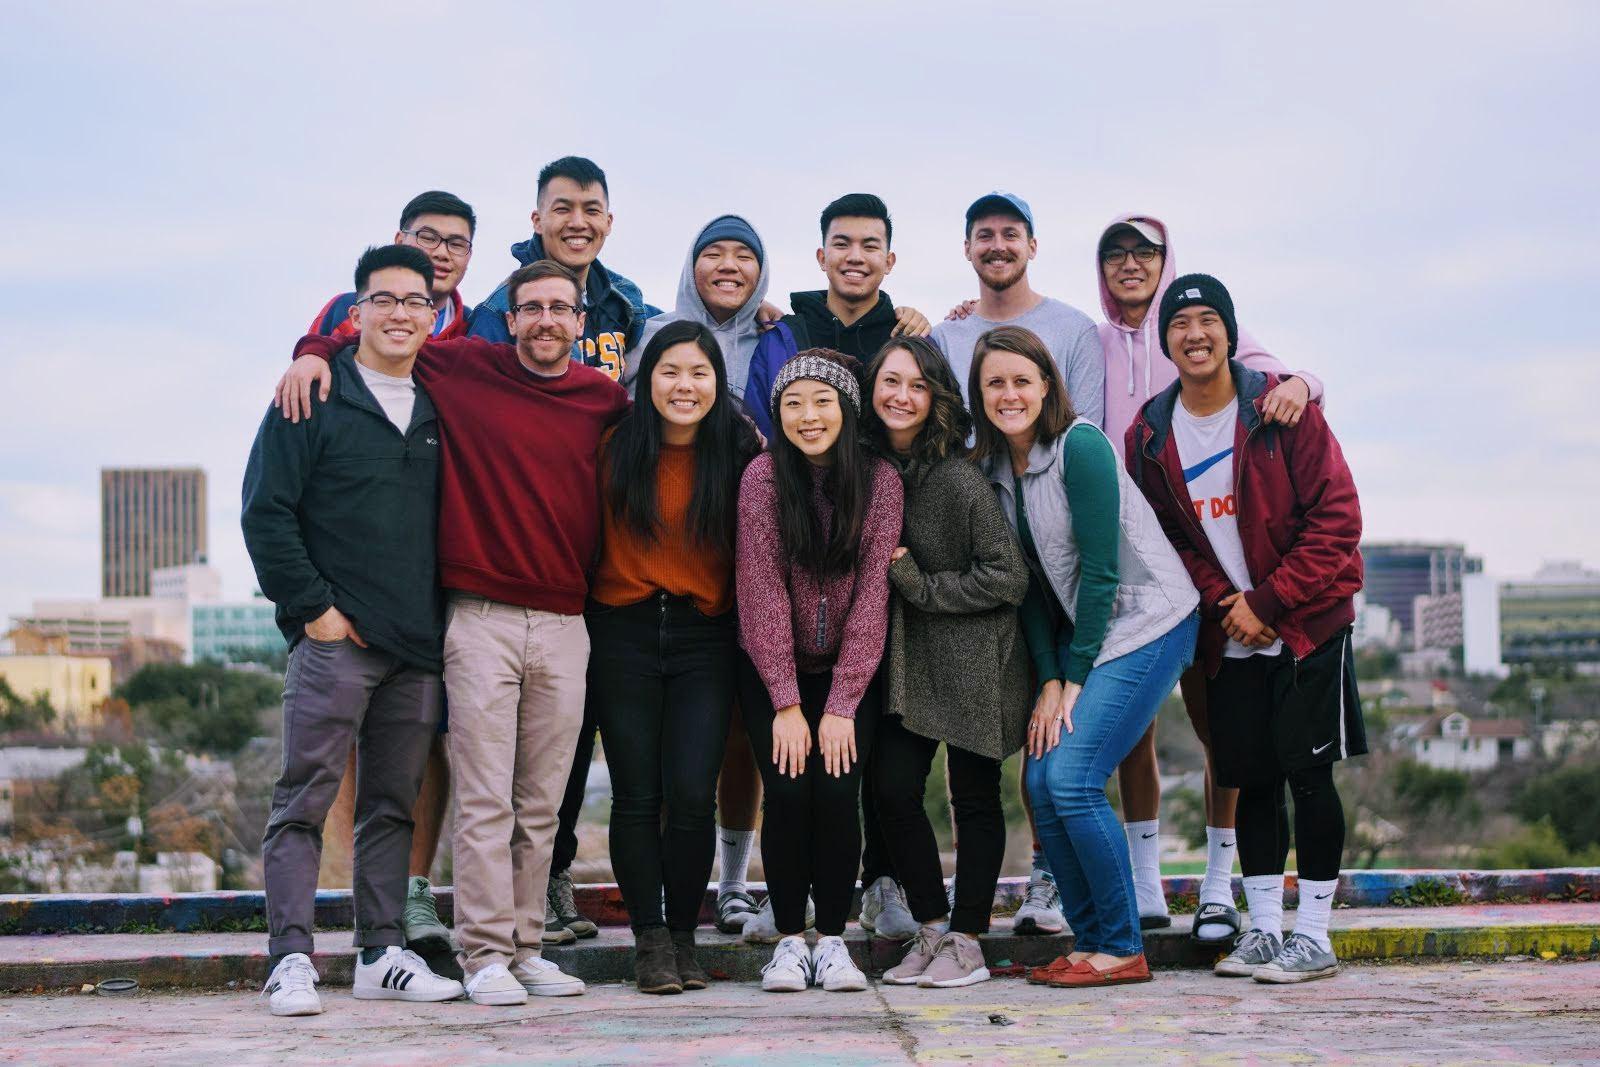 UCSD-2019.JPG